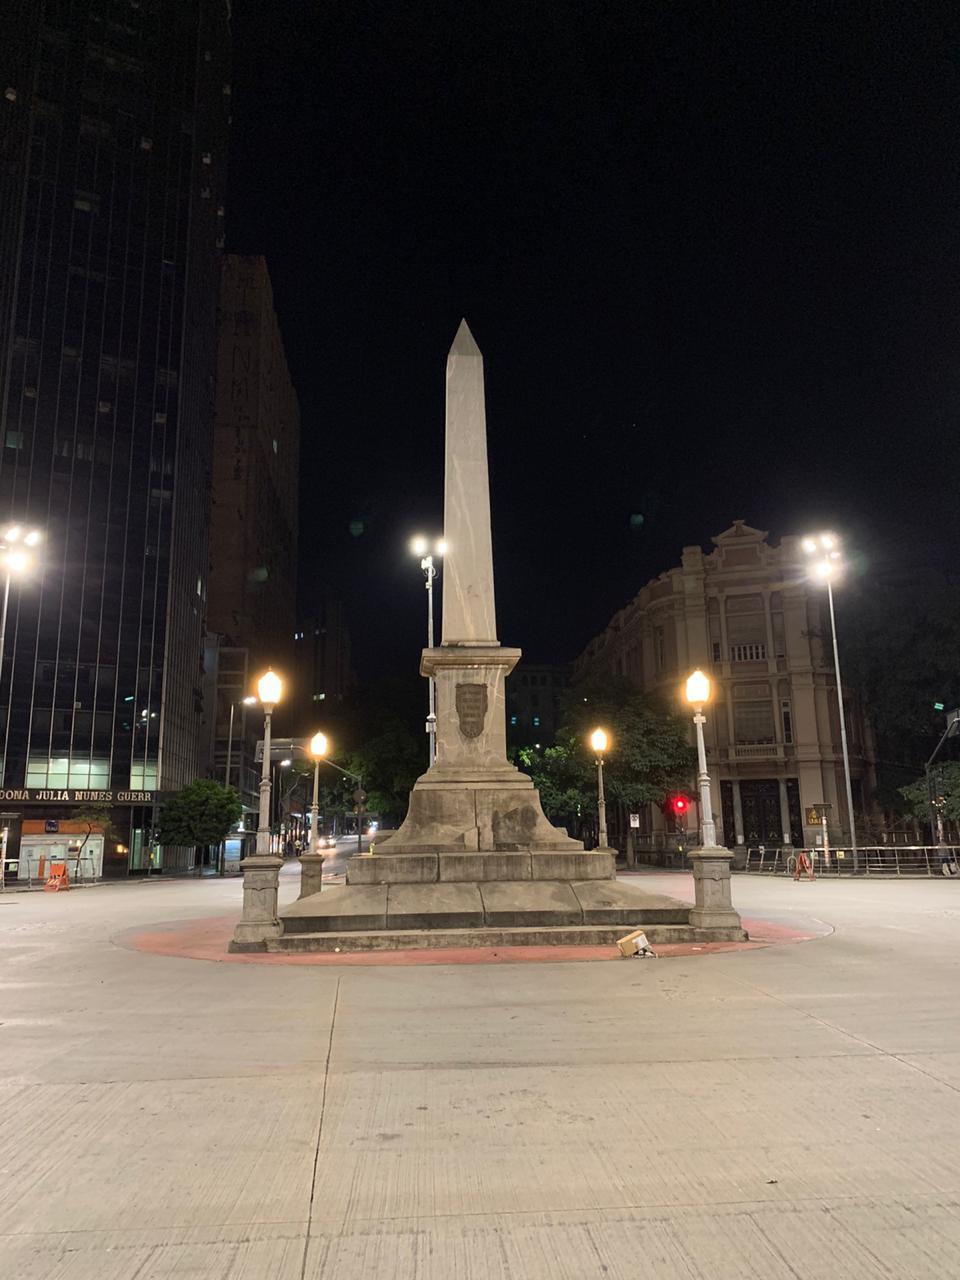 O obelisco limpo